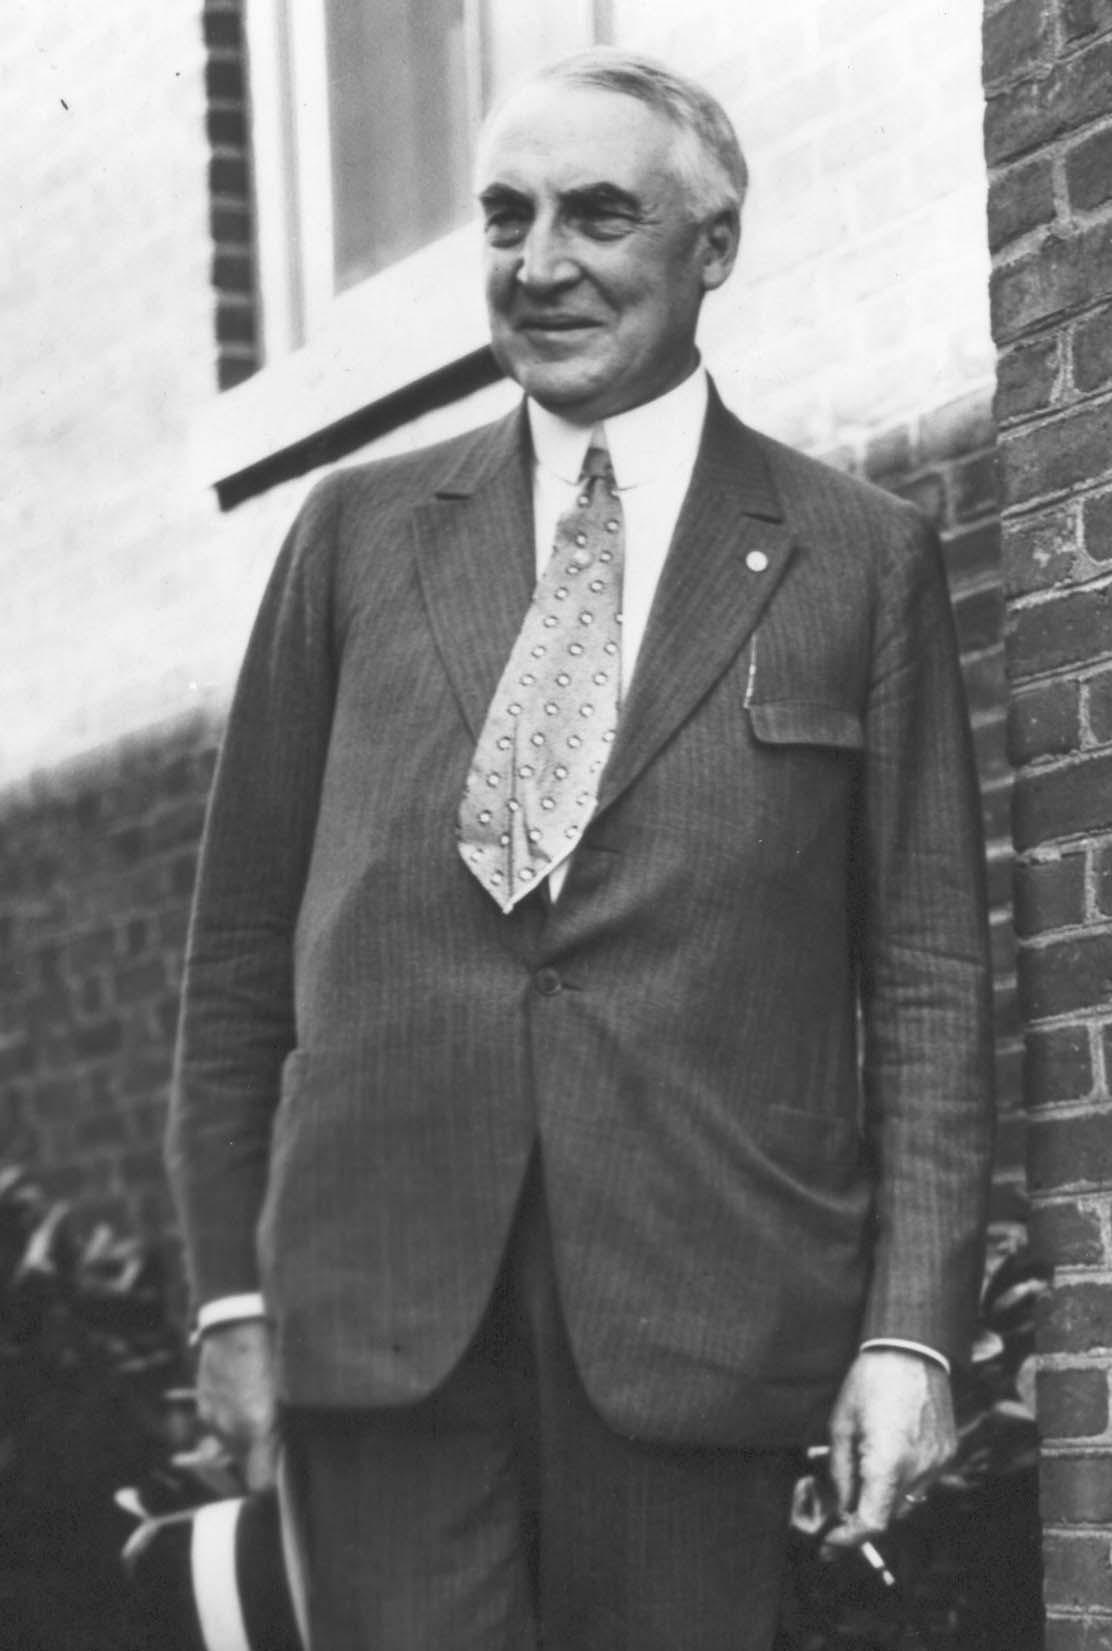 United States President Warren Gamaliel Harding